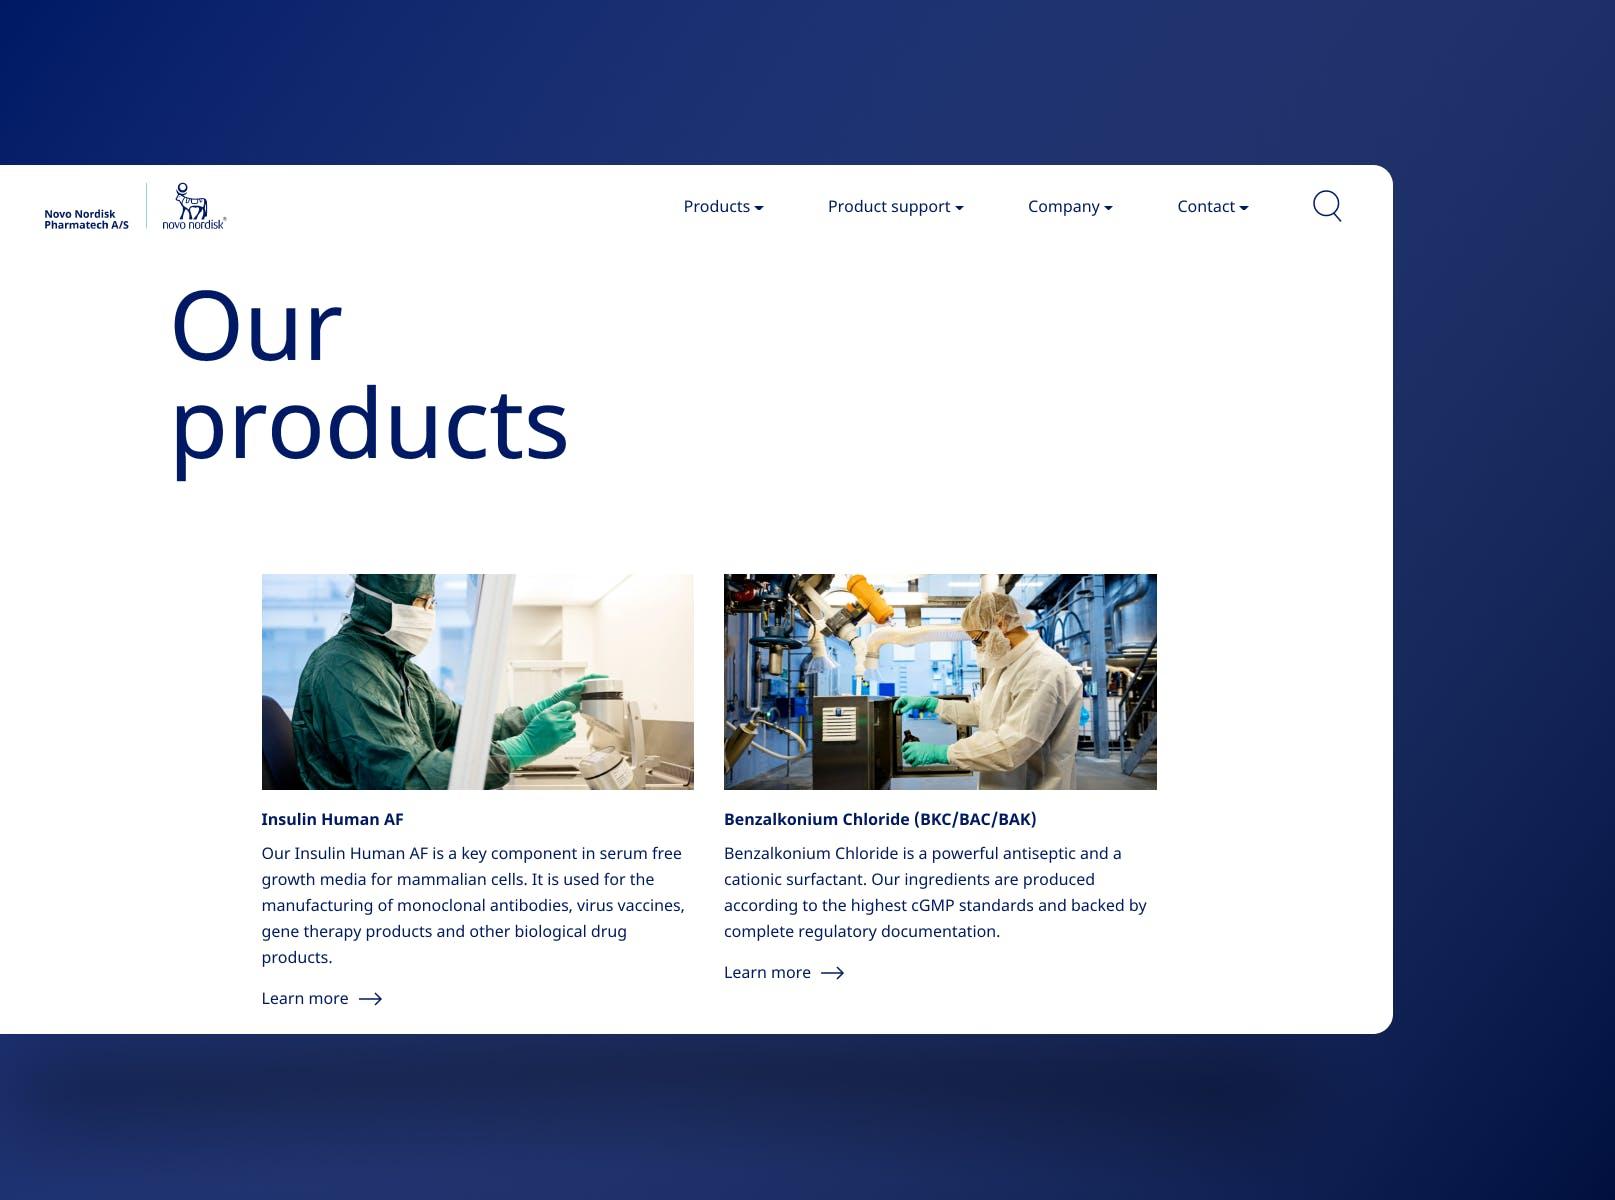 Novo Nordisk Pharmatech